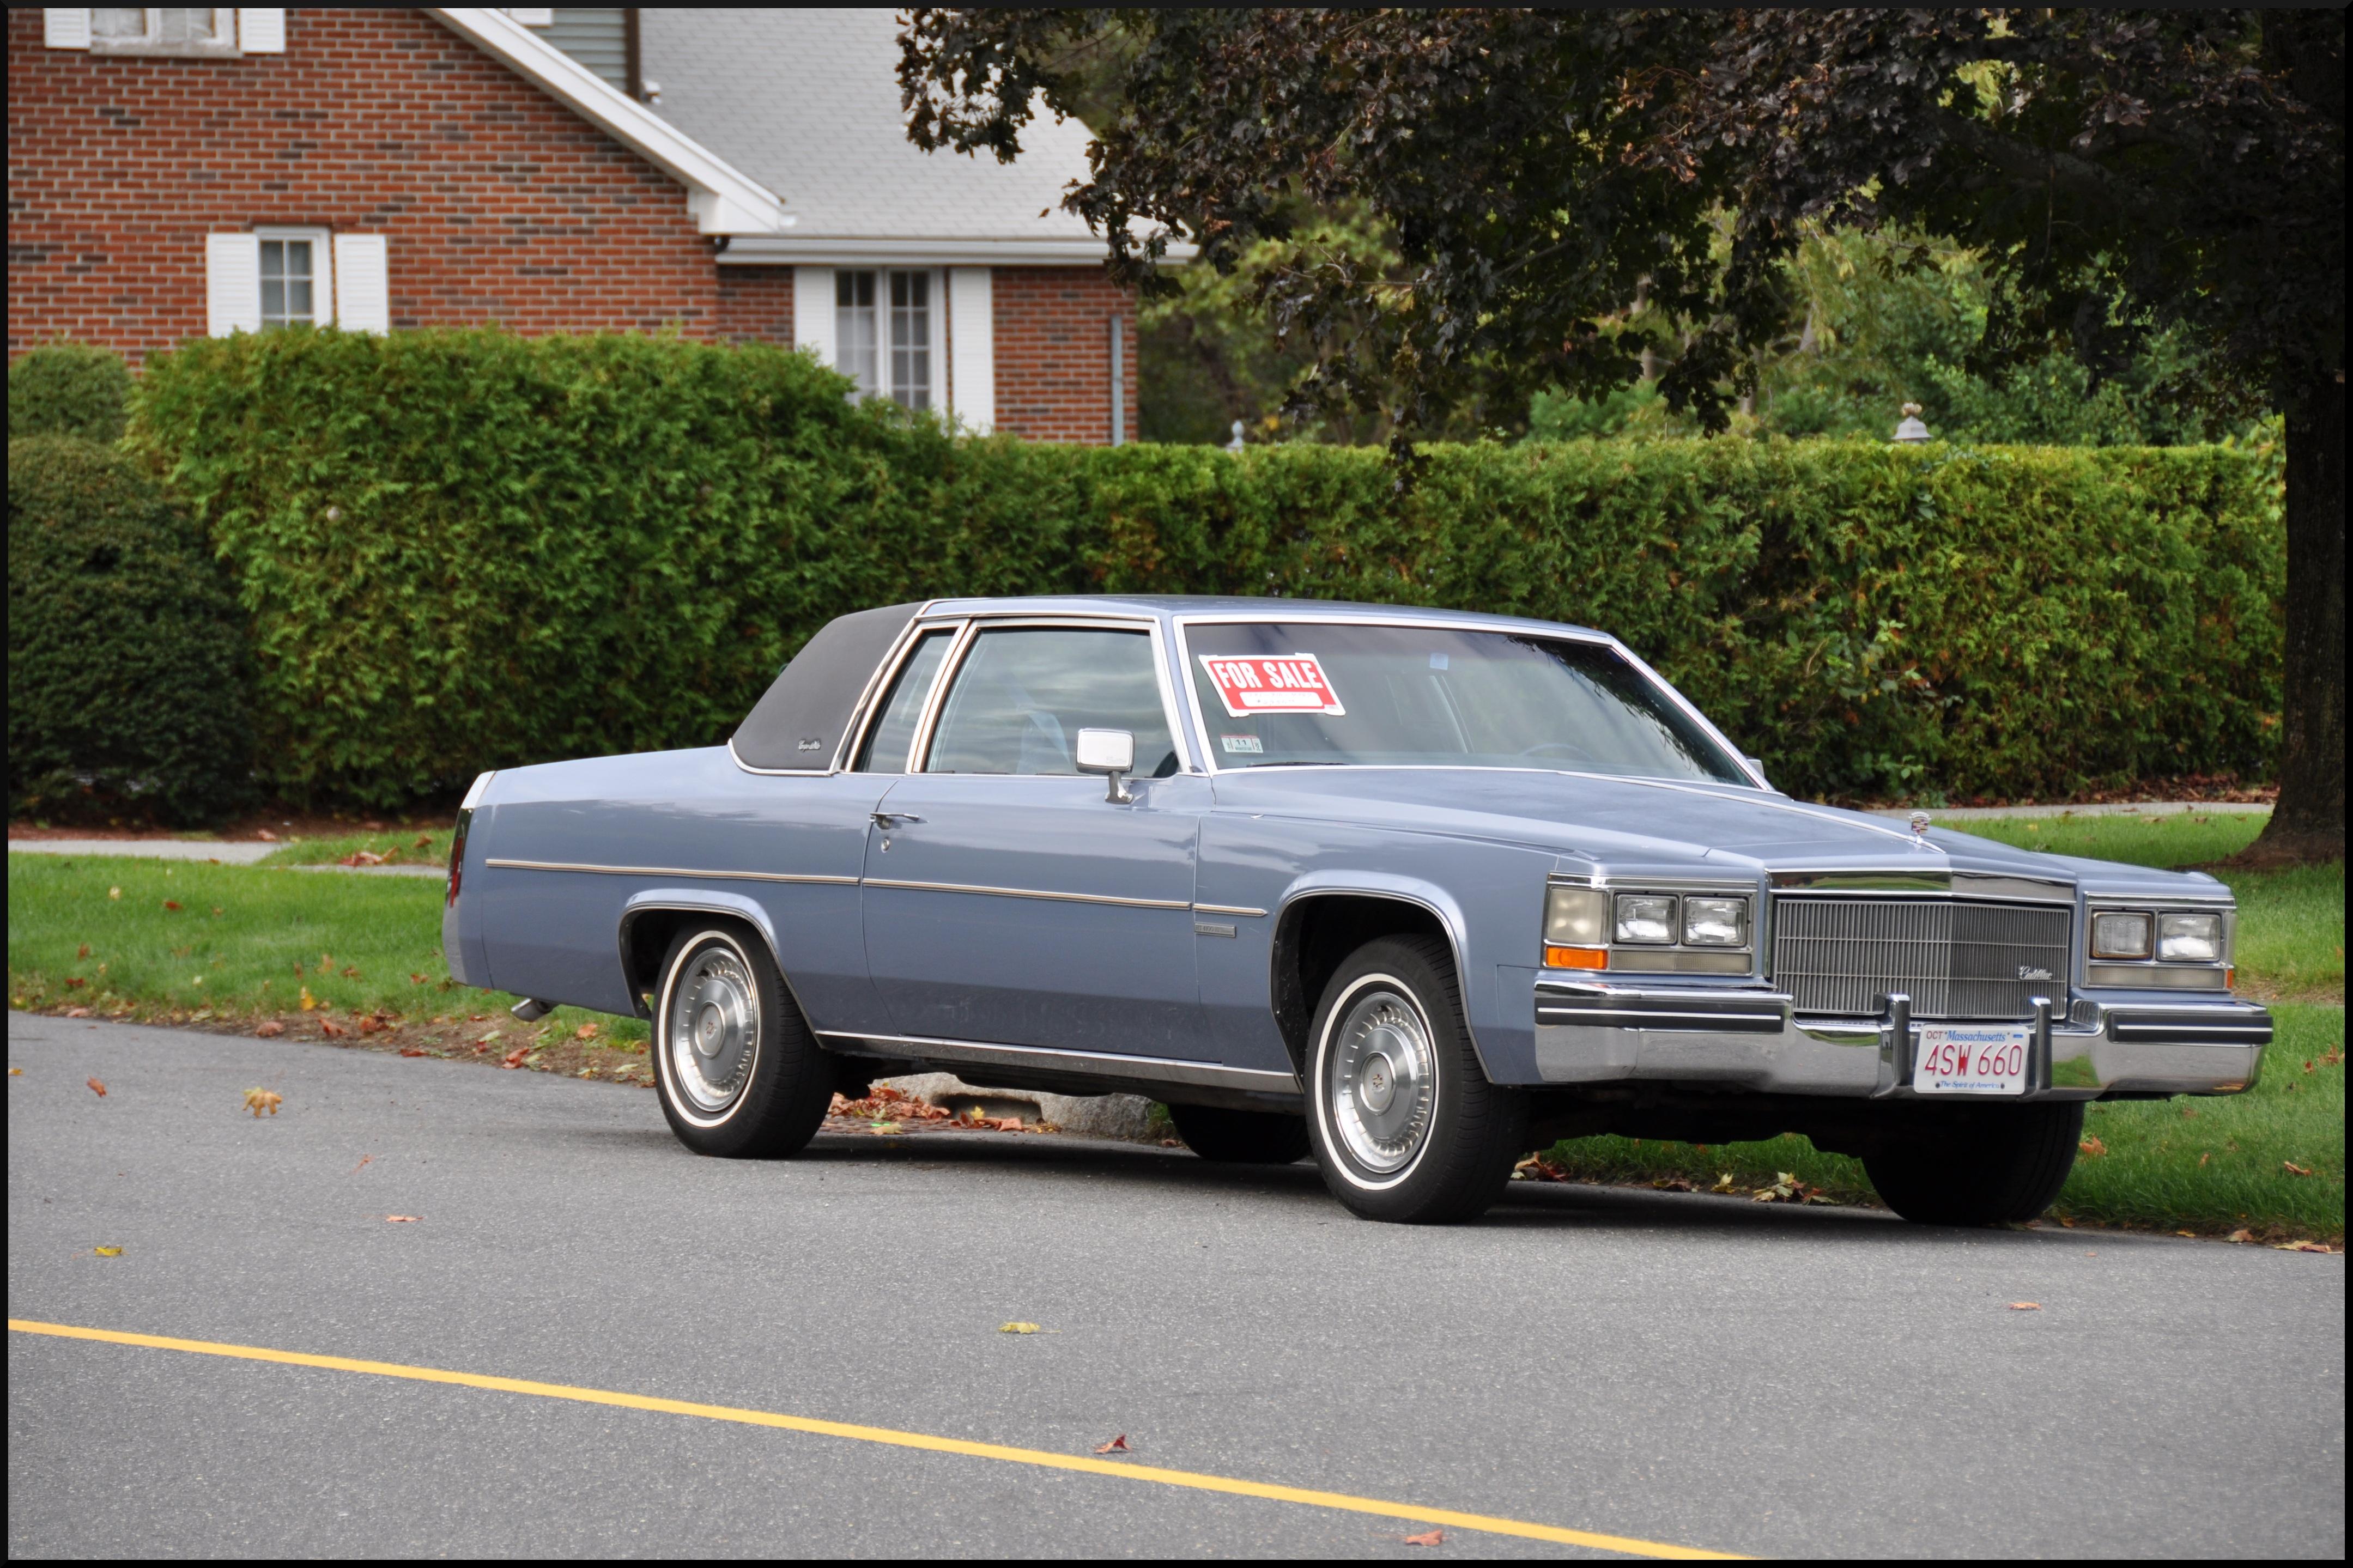 File:1983 Cadillac Coupe de Ville.jpg - Wikimedia Commons